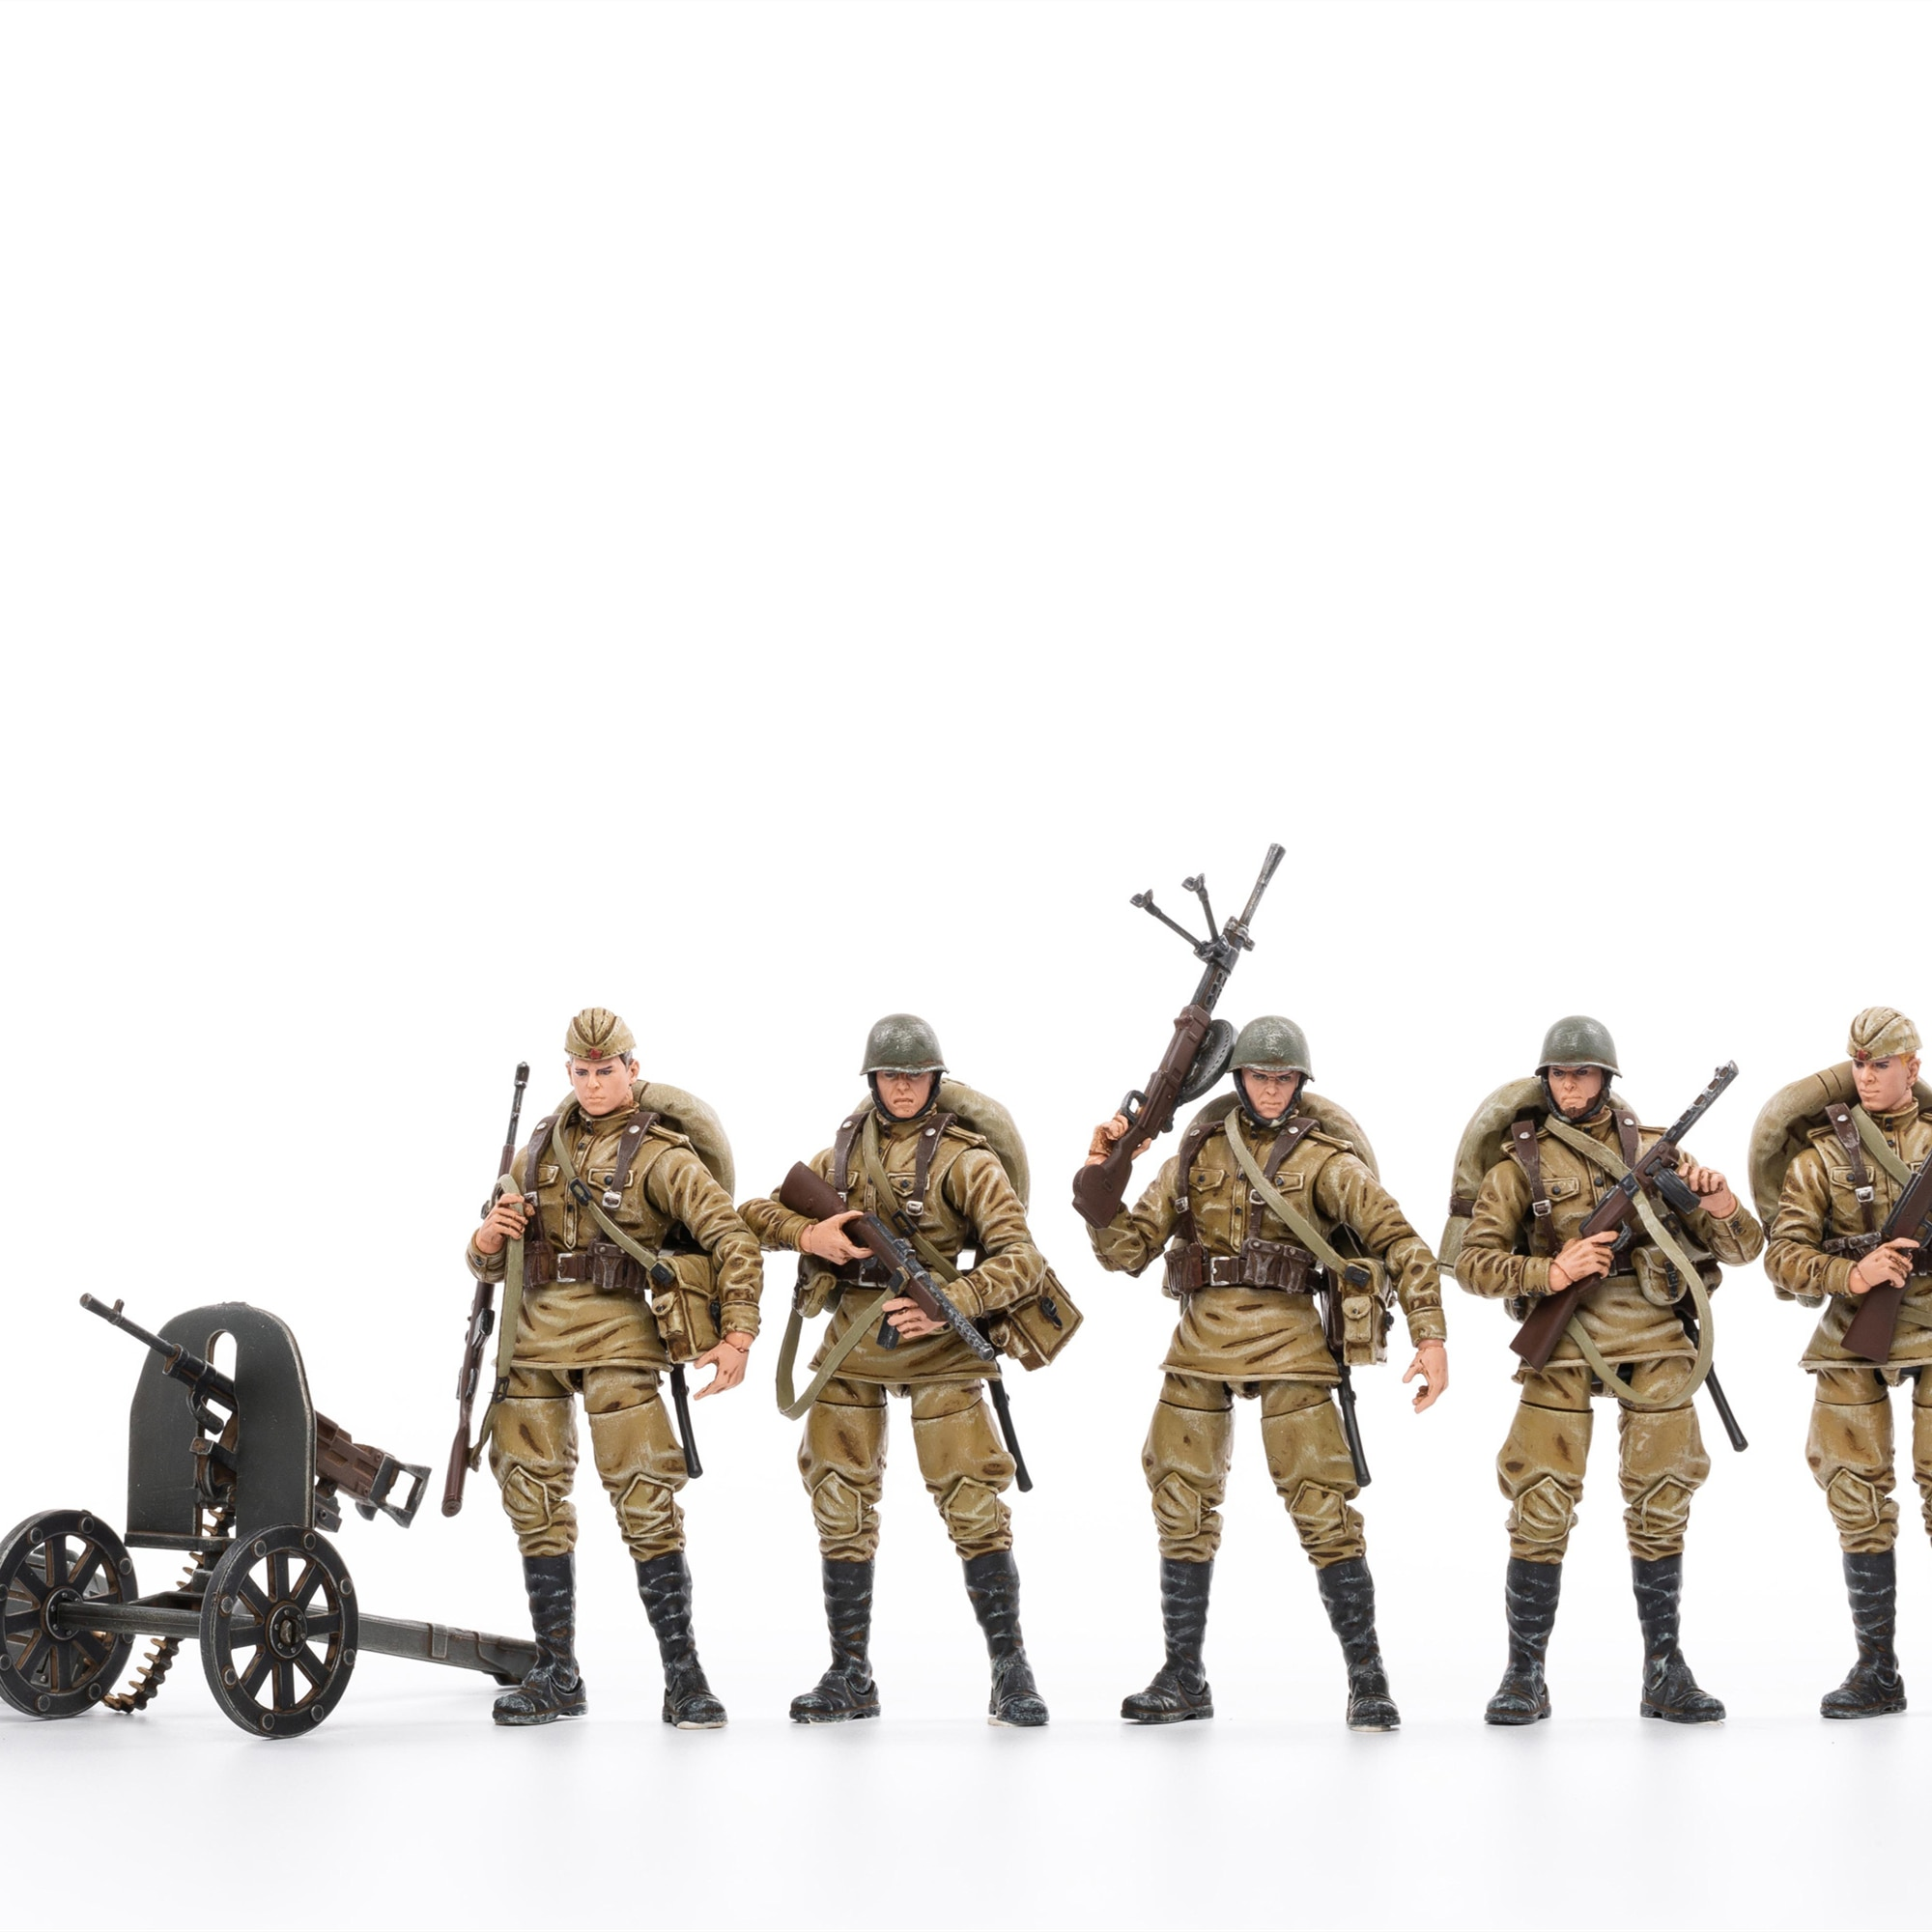 1/18 JOYTOY عمل الشكل الحرب العالمية الثانية السوفياتي المشاة الجندي تحصيل لعبة نموذج العسكرية هدية الكريسماس السفينة حرة